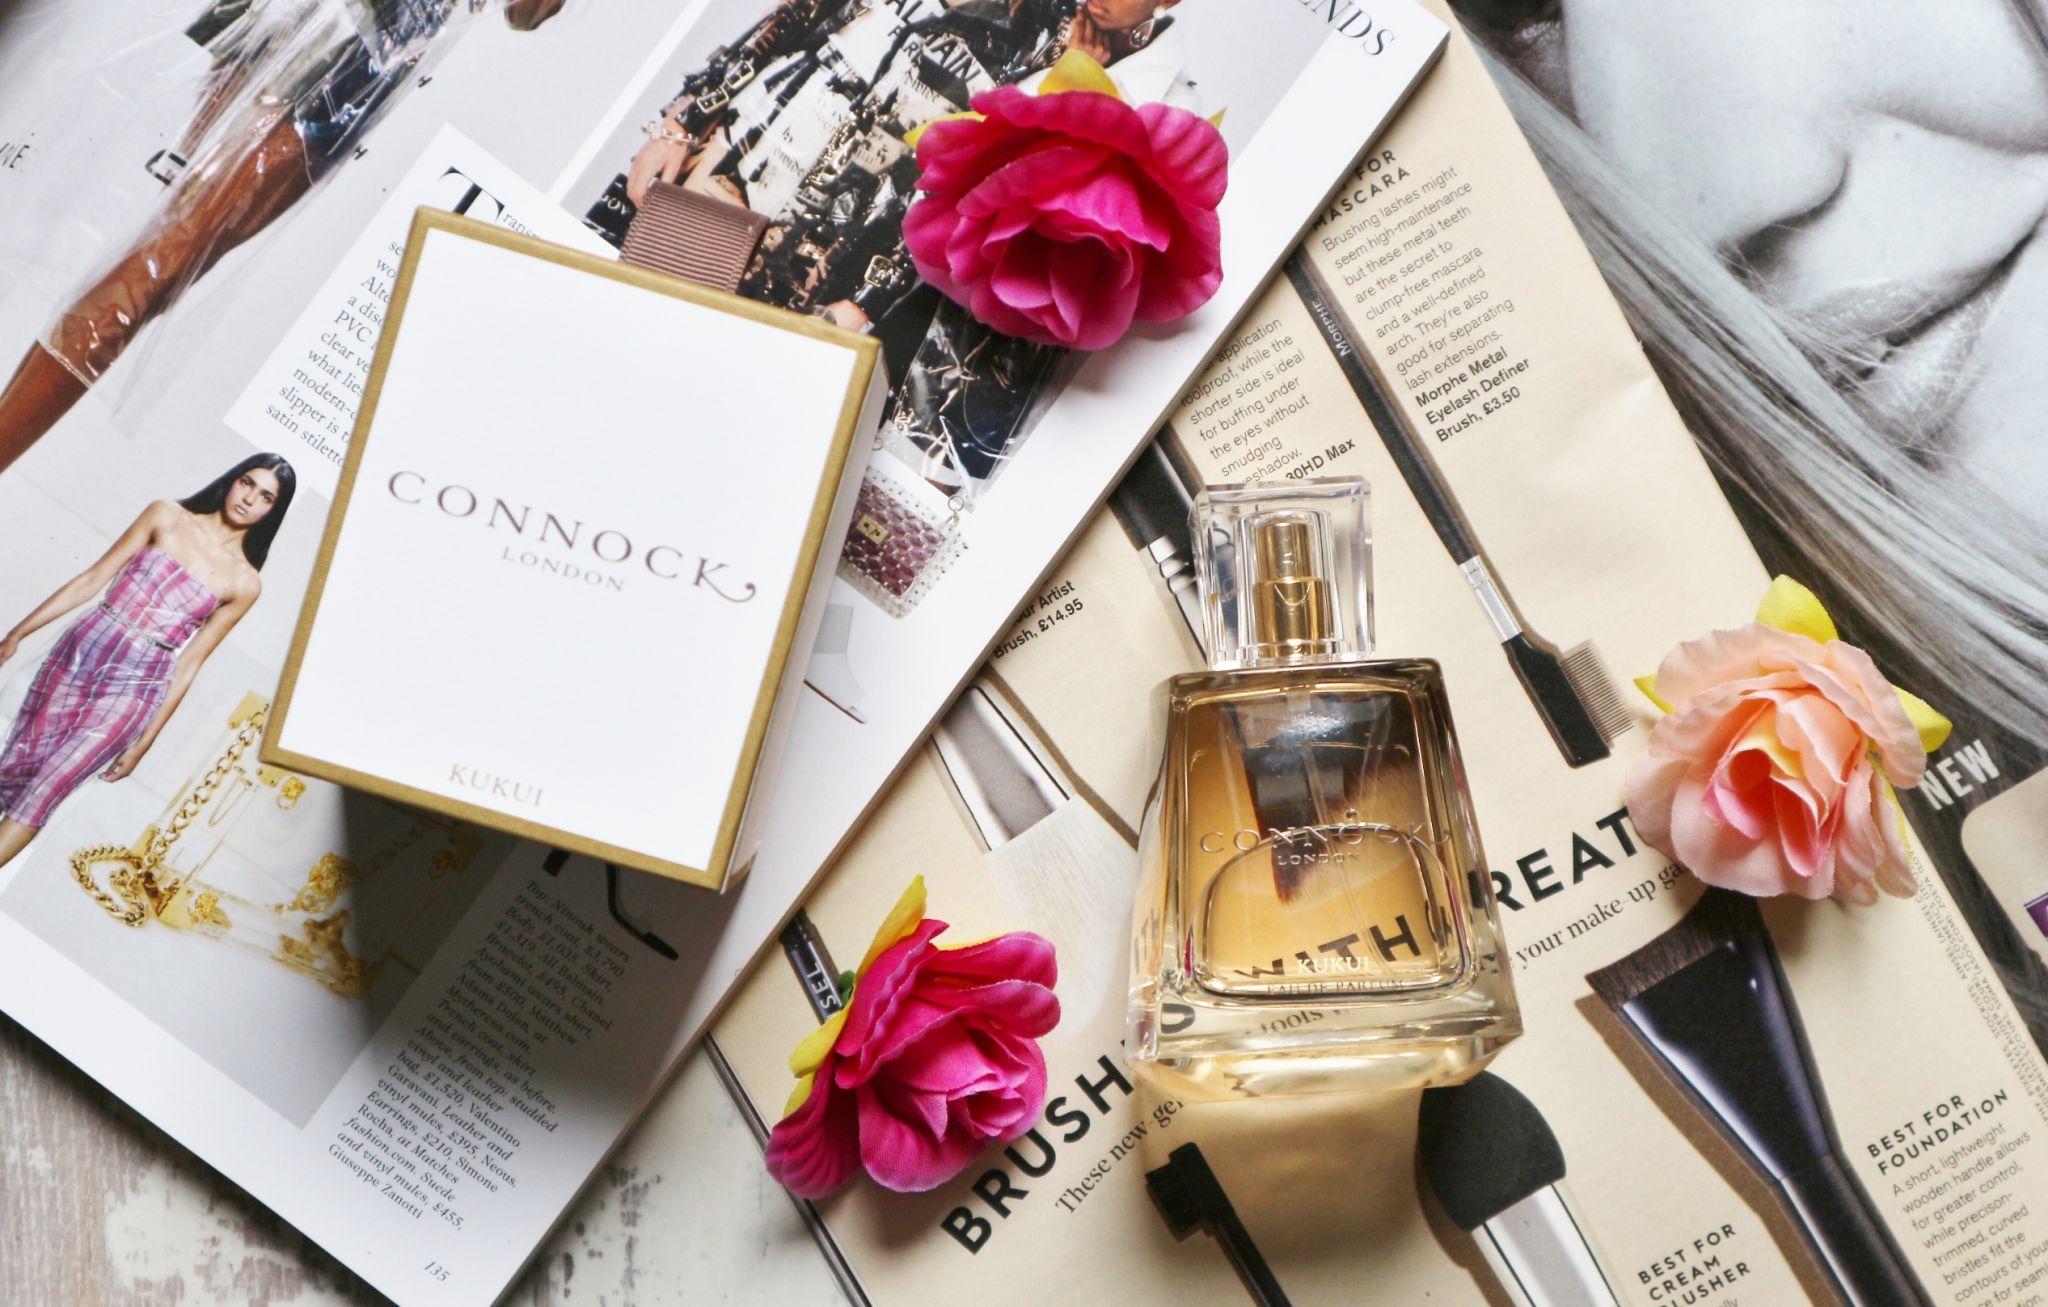 connock london kukui perfume